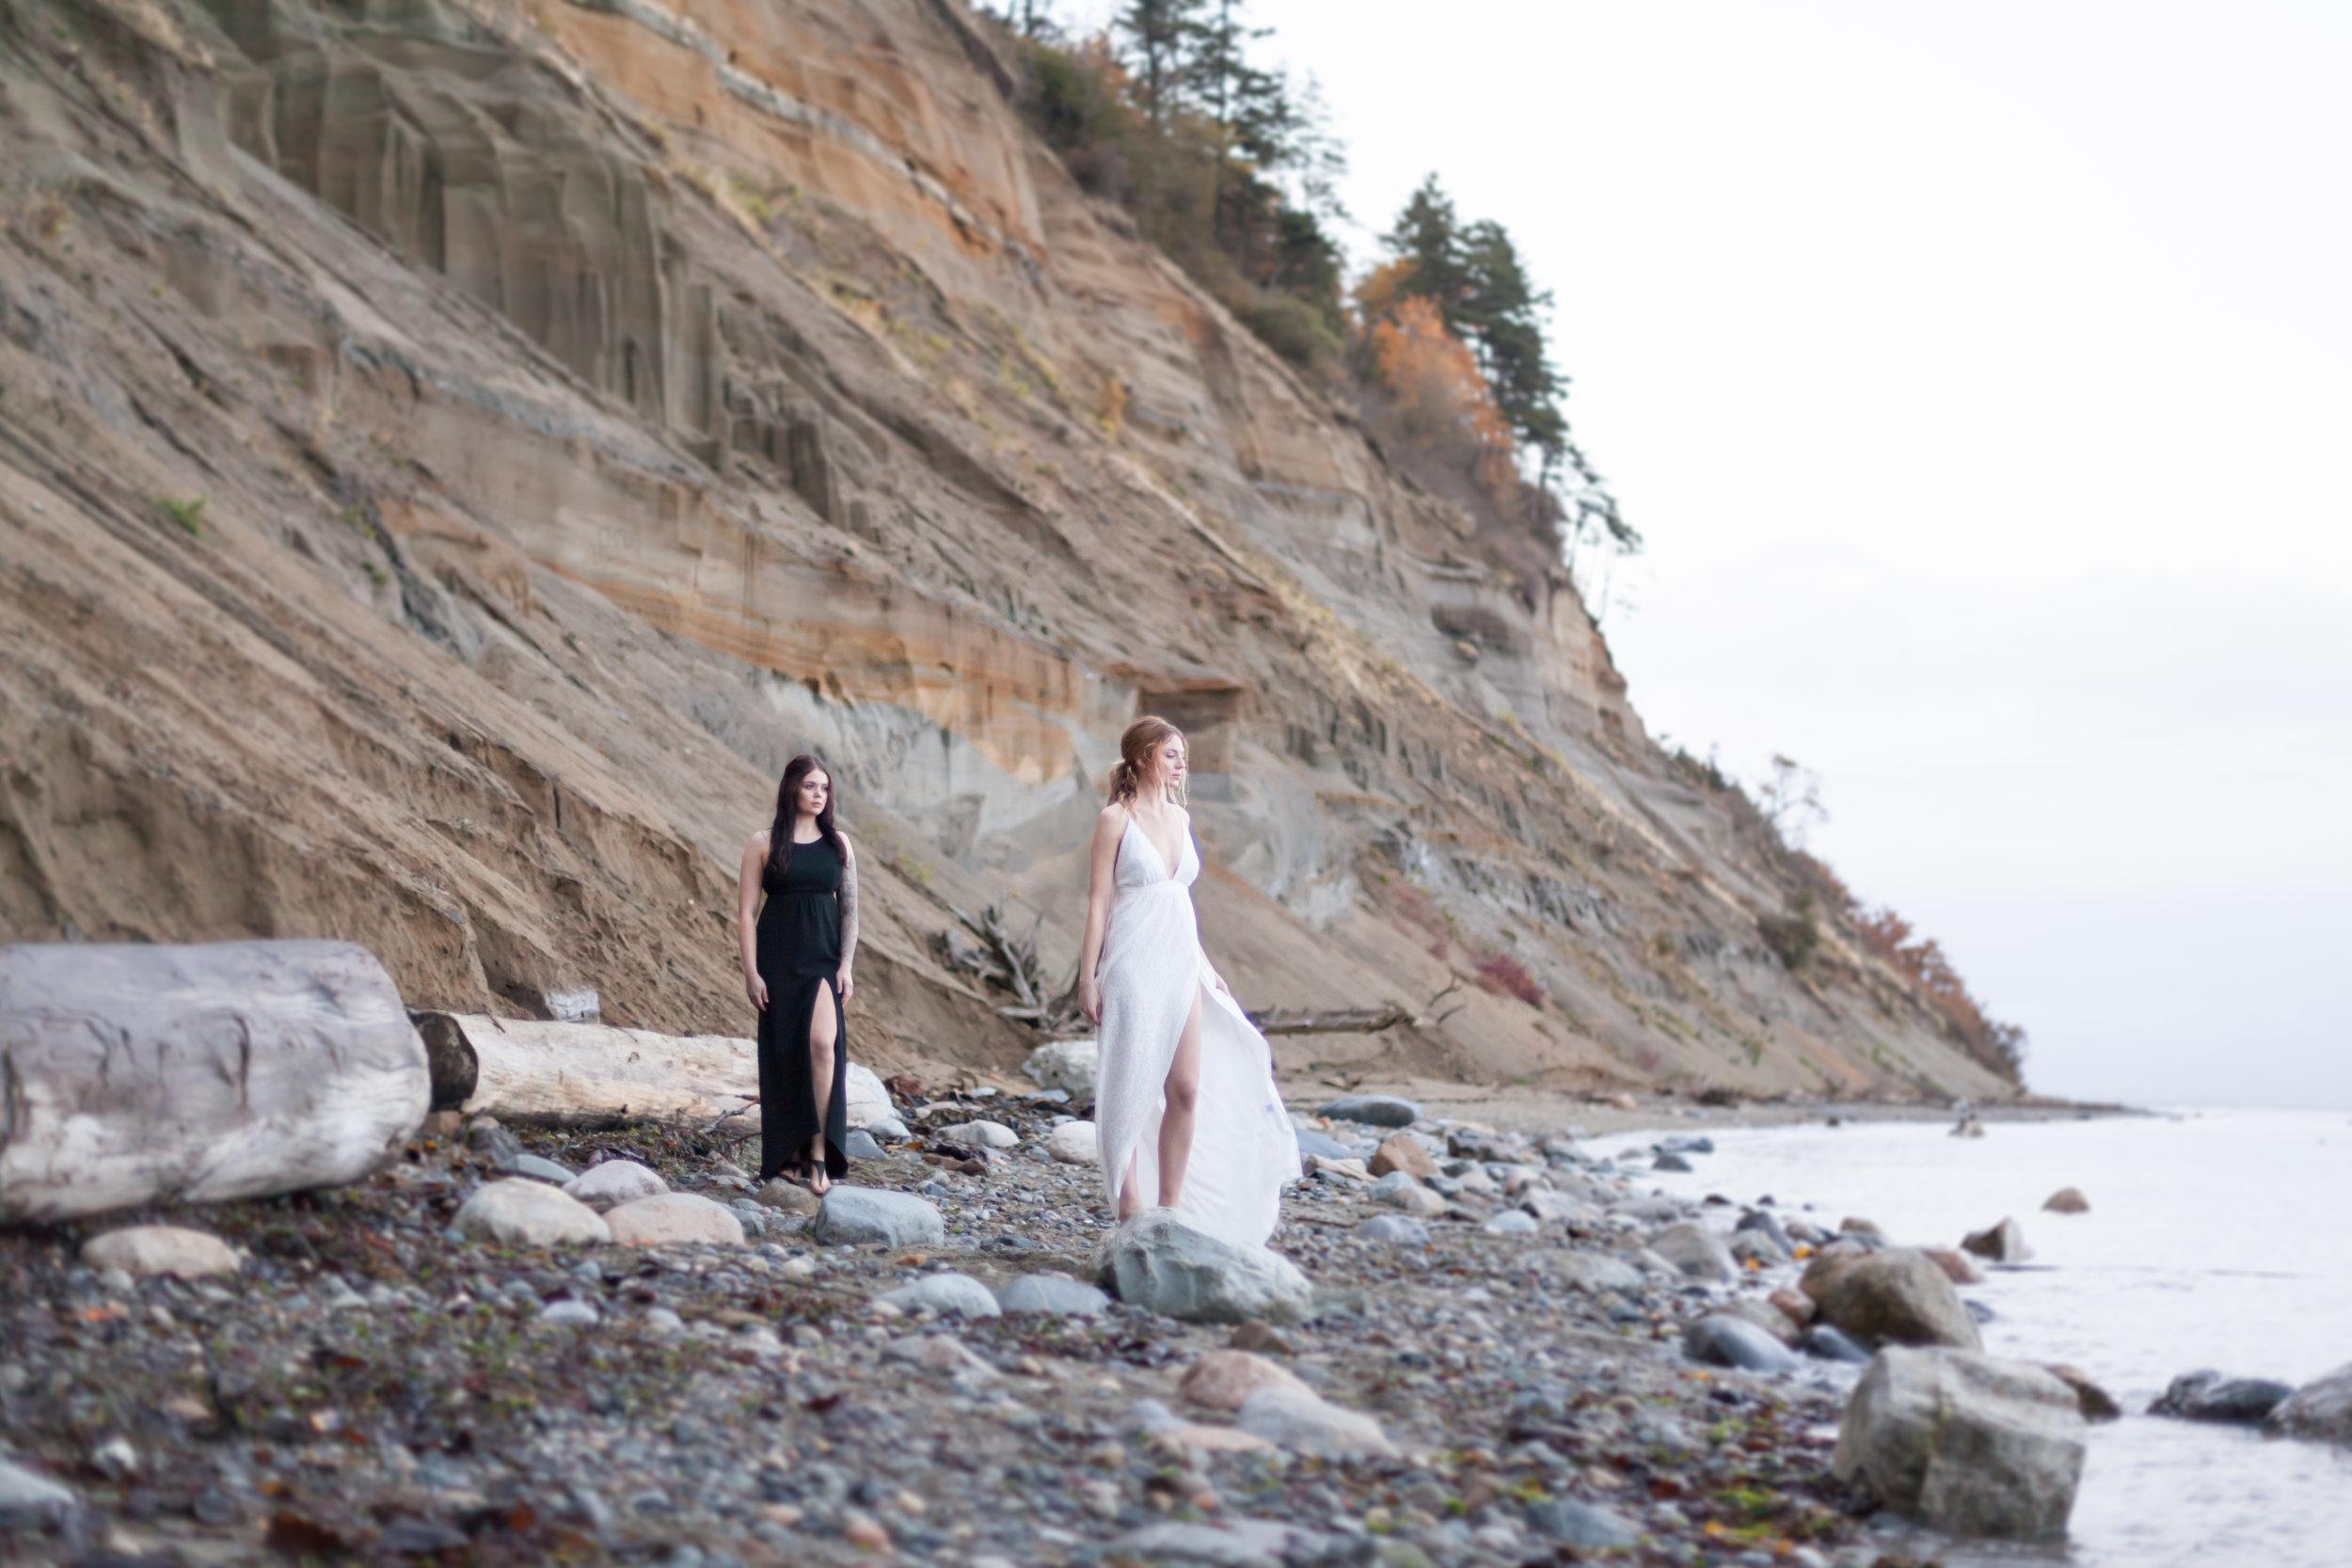 Point Roberts Wedding Photos 6.jpg